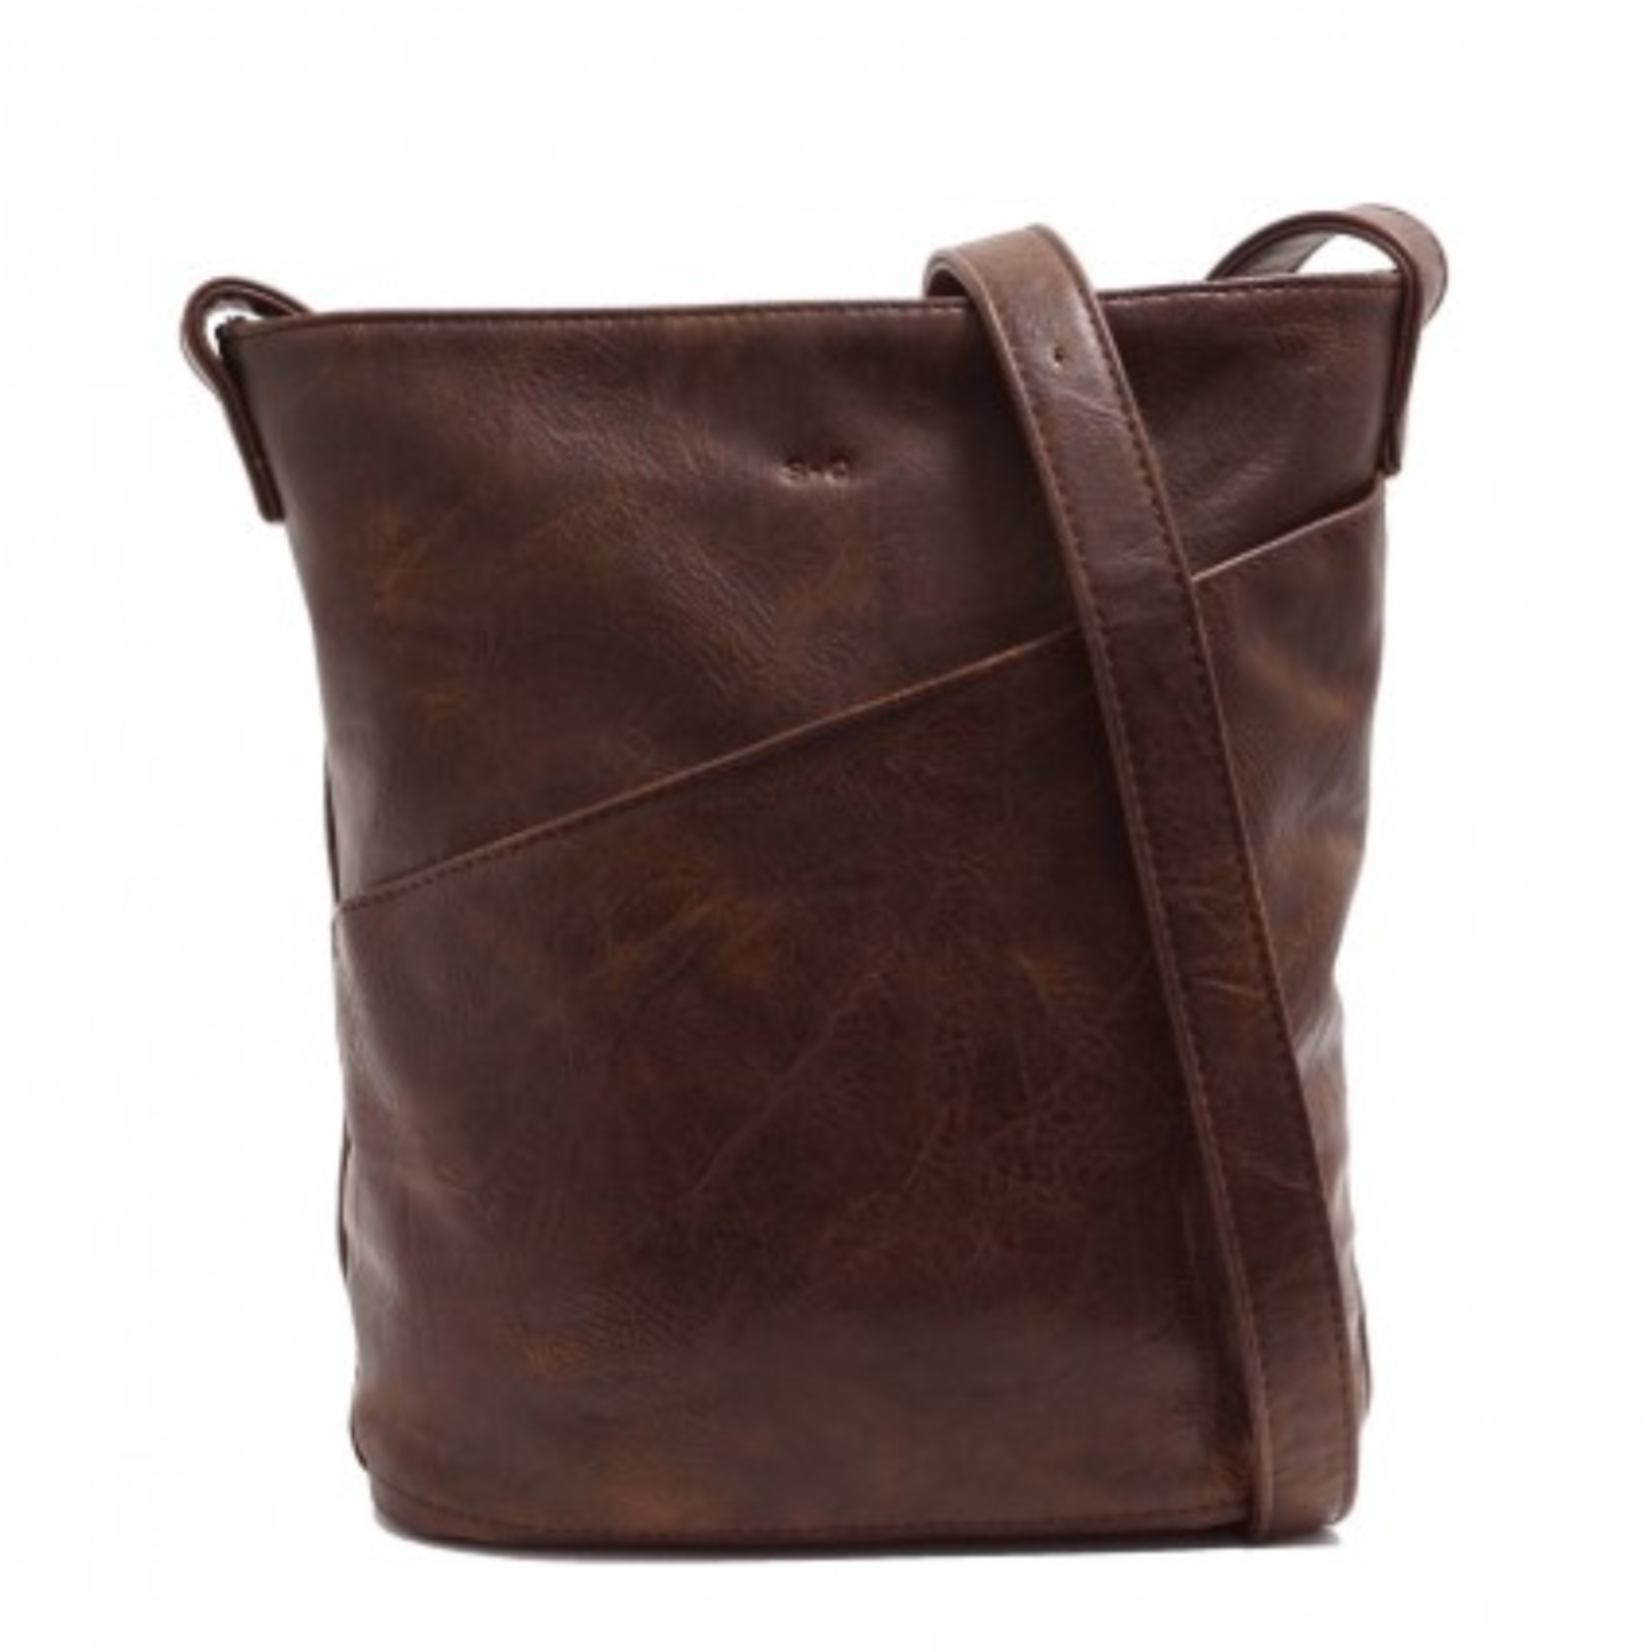 S-Q Inc. Martha Hobo Bag